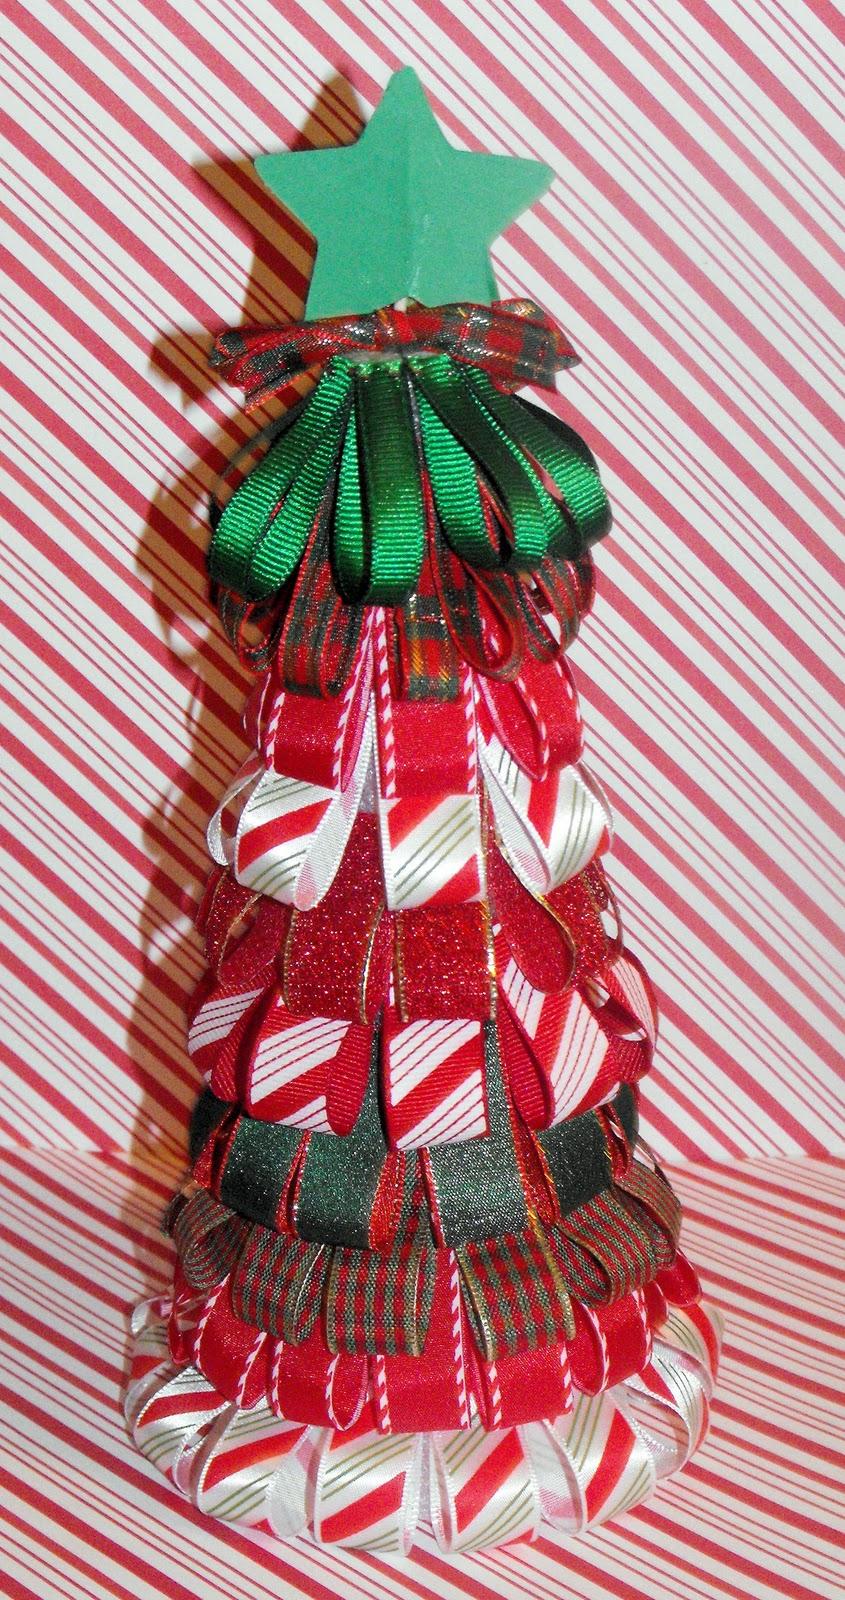 http://1.bp.blogspot.com/_chSWwsAhn0o/TPIFd9gZQxI/AAAAAAAACwE/asKiIK7cMGo/s1600/moms+ribbon+looped+tree.jpg